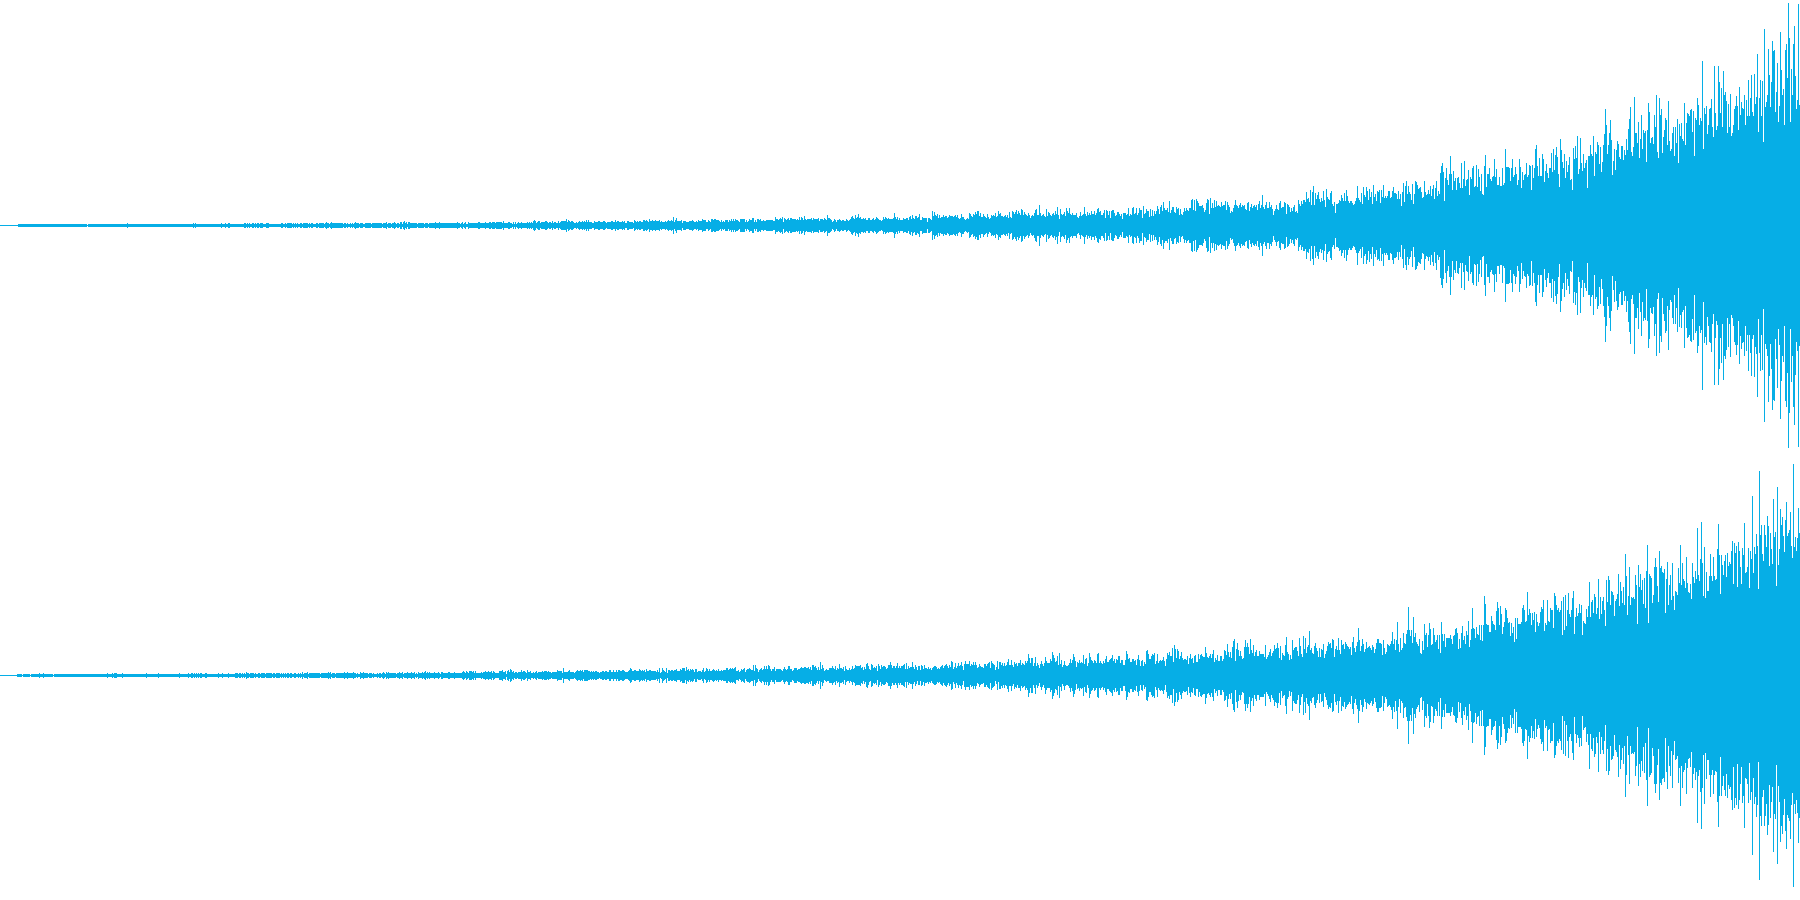 Shining 映像用リバースエフェクトの再生済みの波形